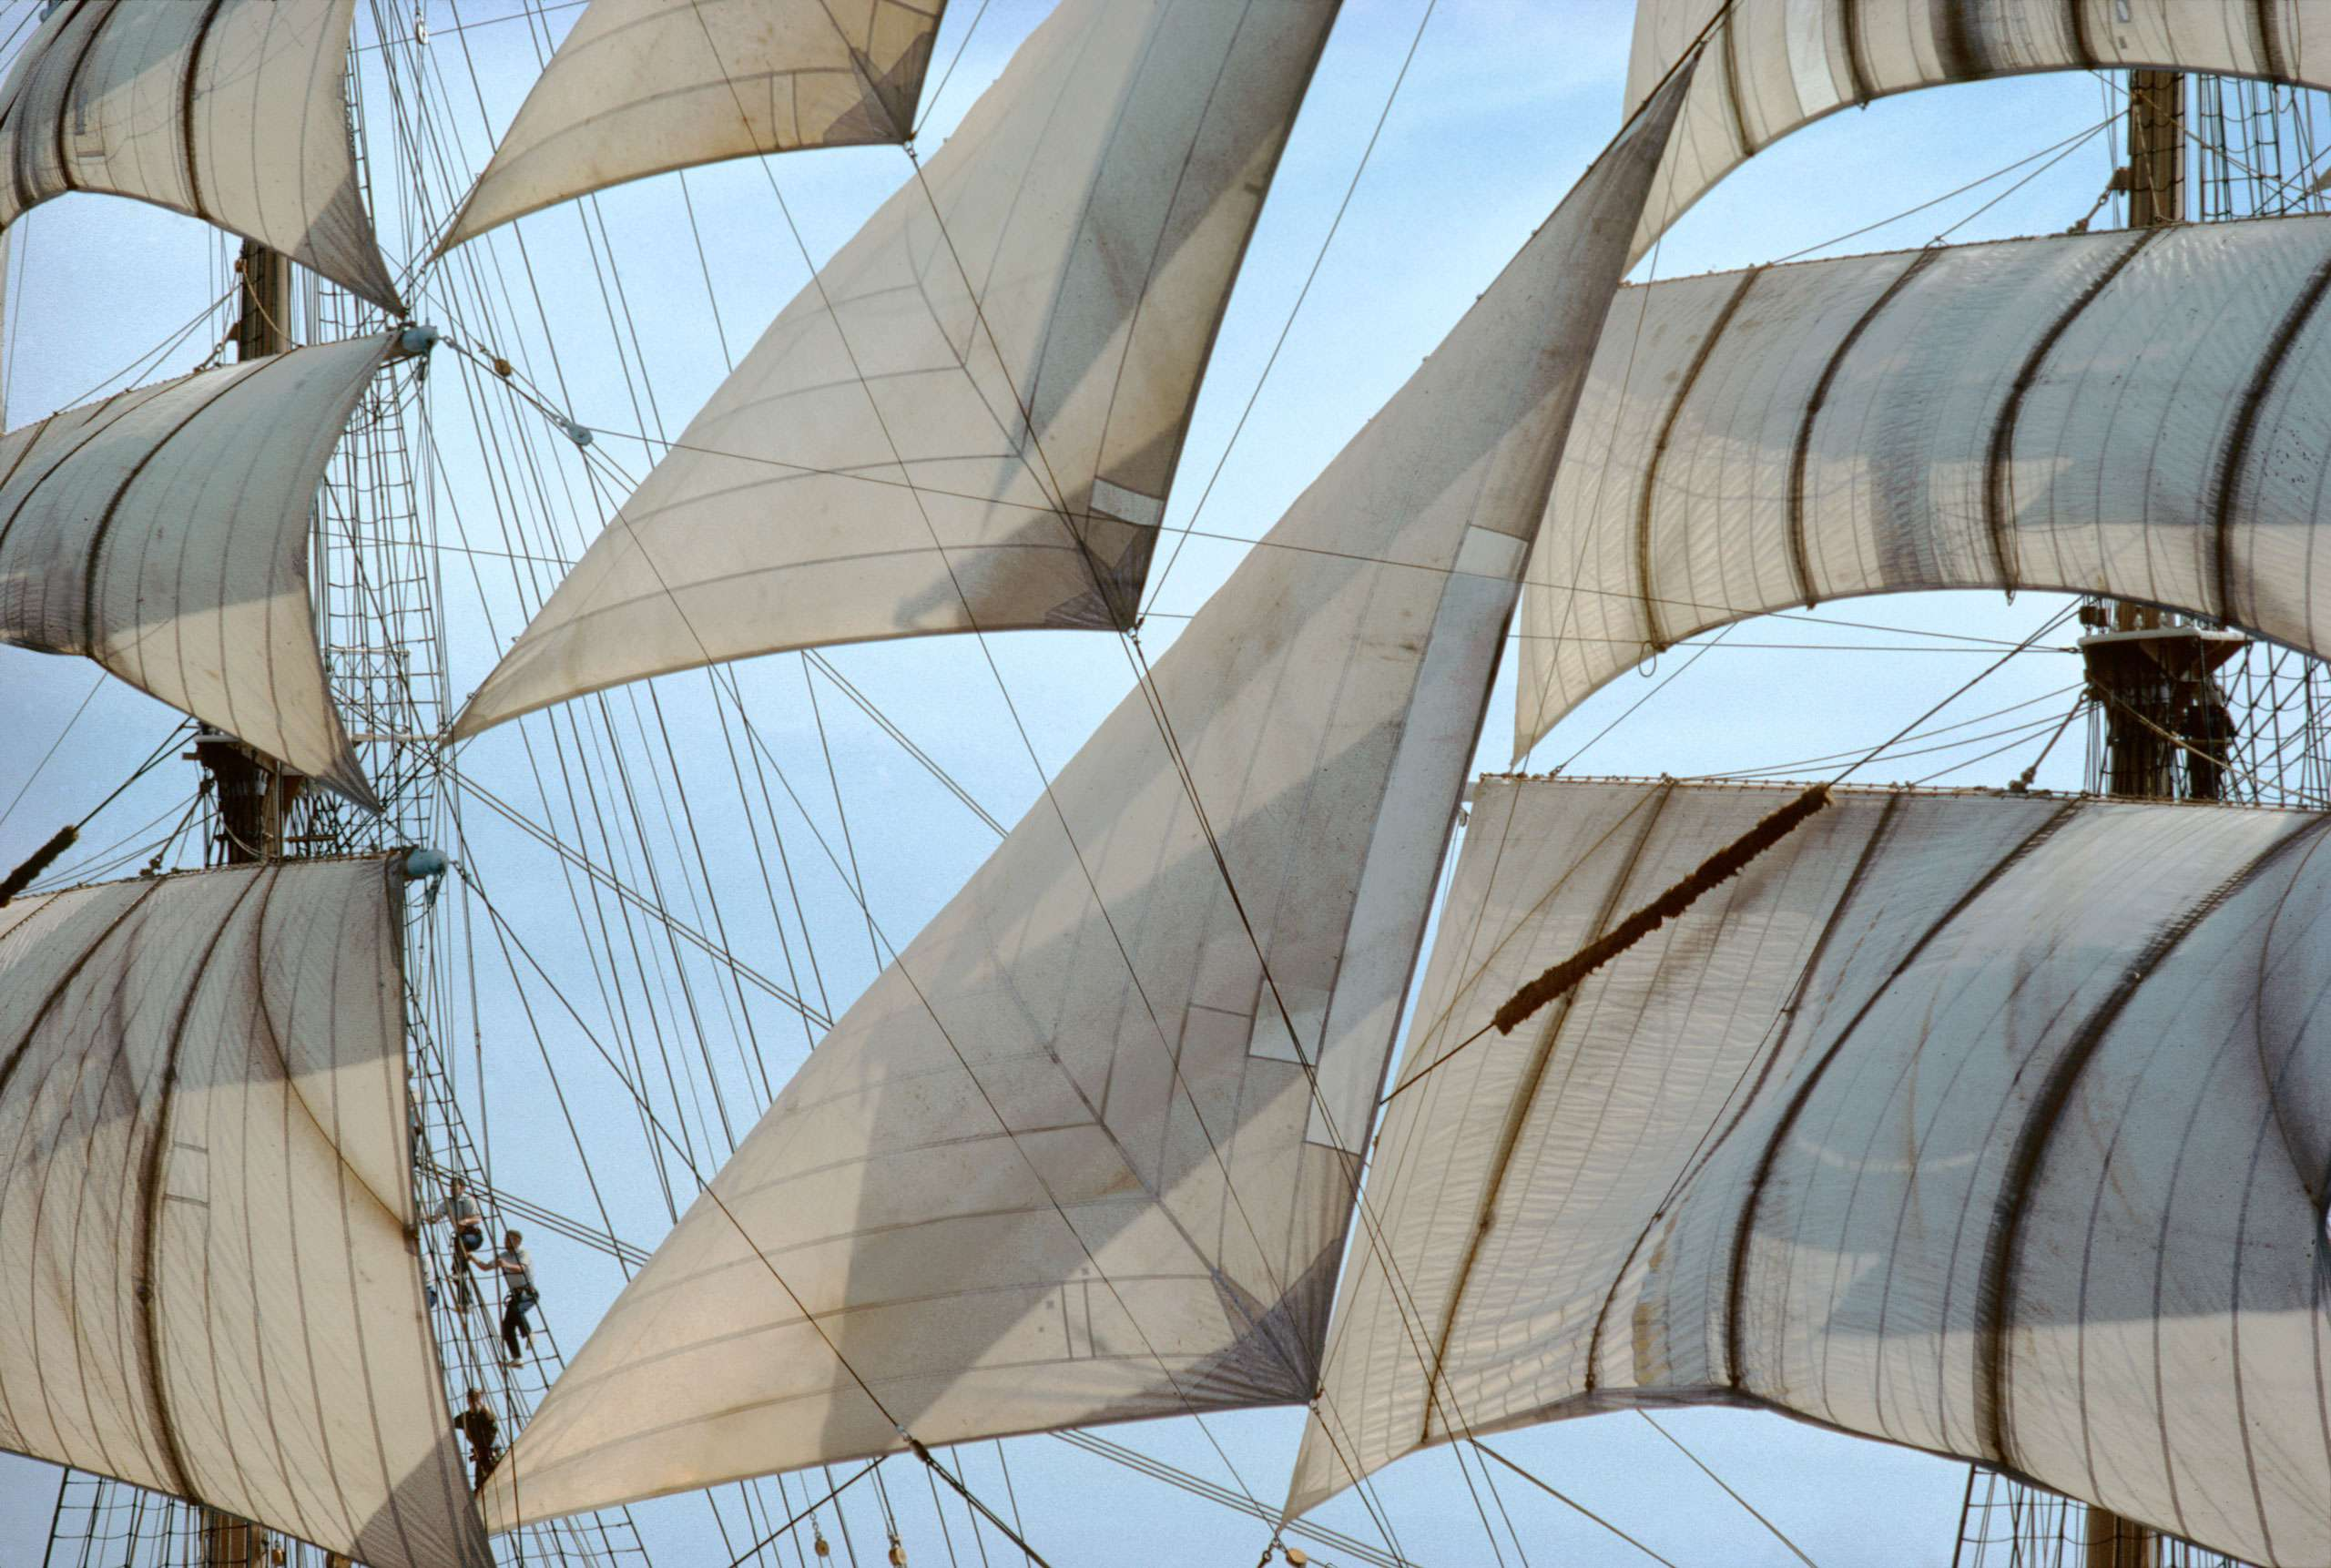 PORTFOLIO - Sailing - Tall Ships #18-PCG097